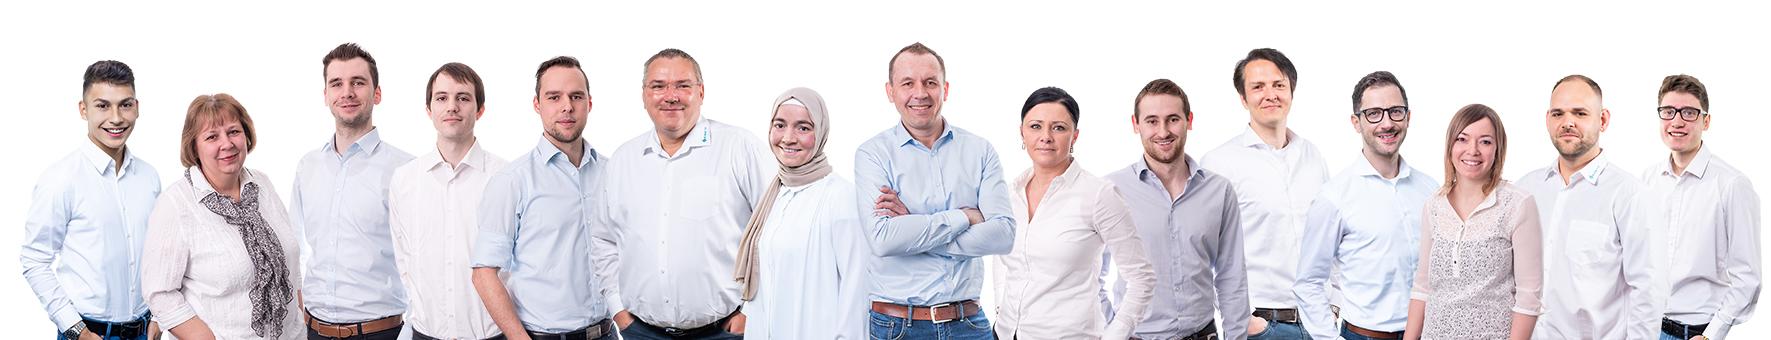 Kiratik-Gruppenfoto